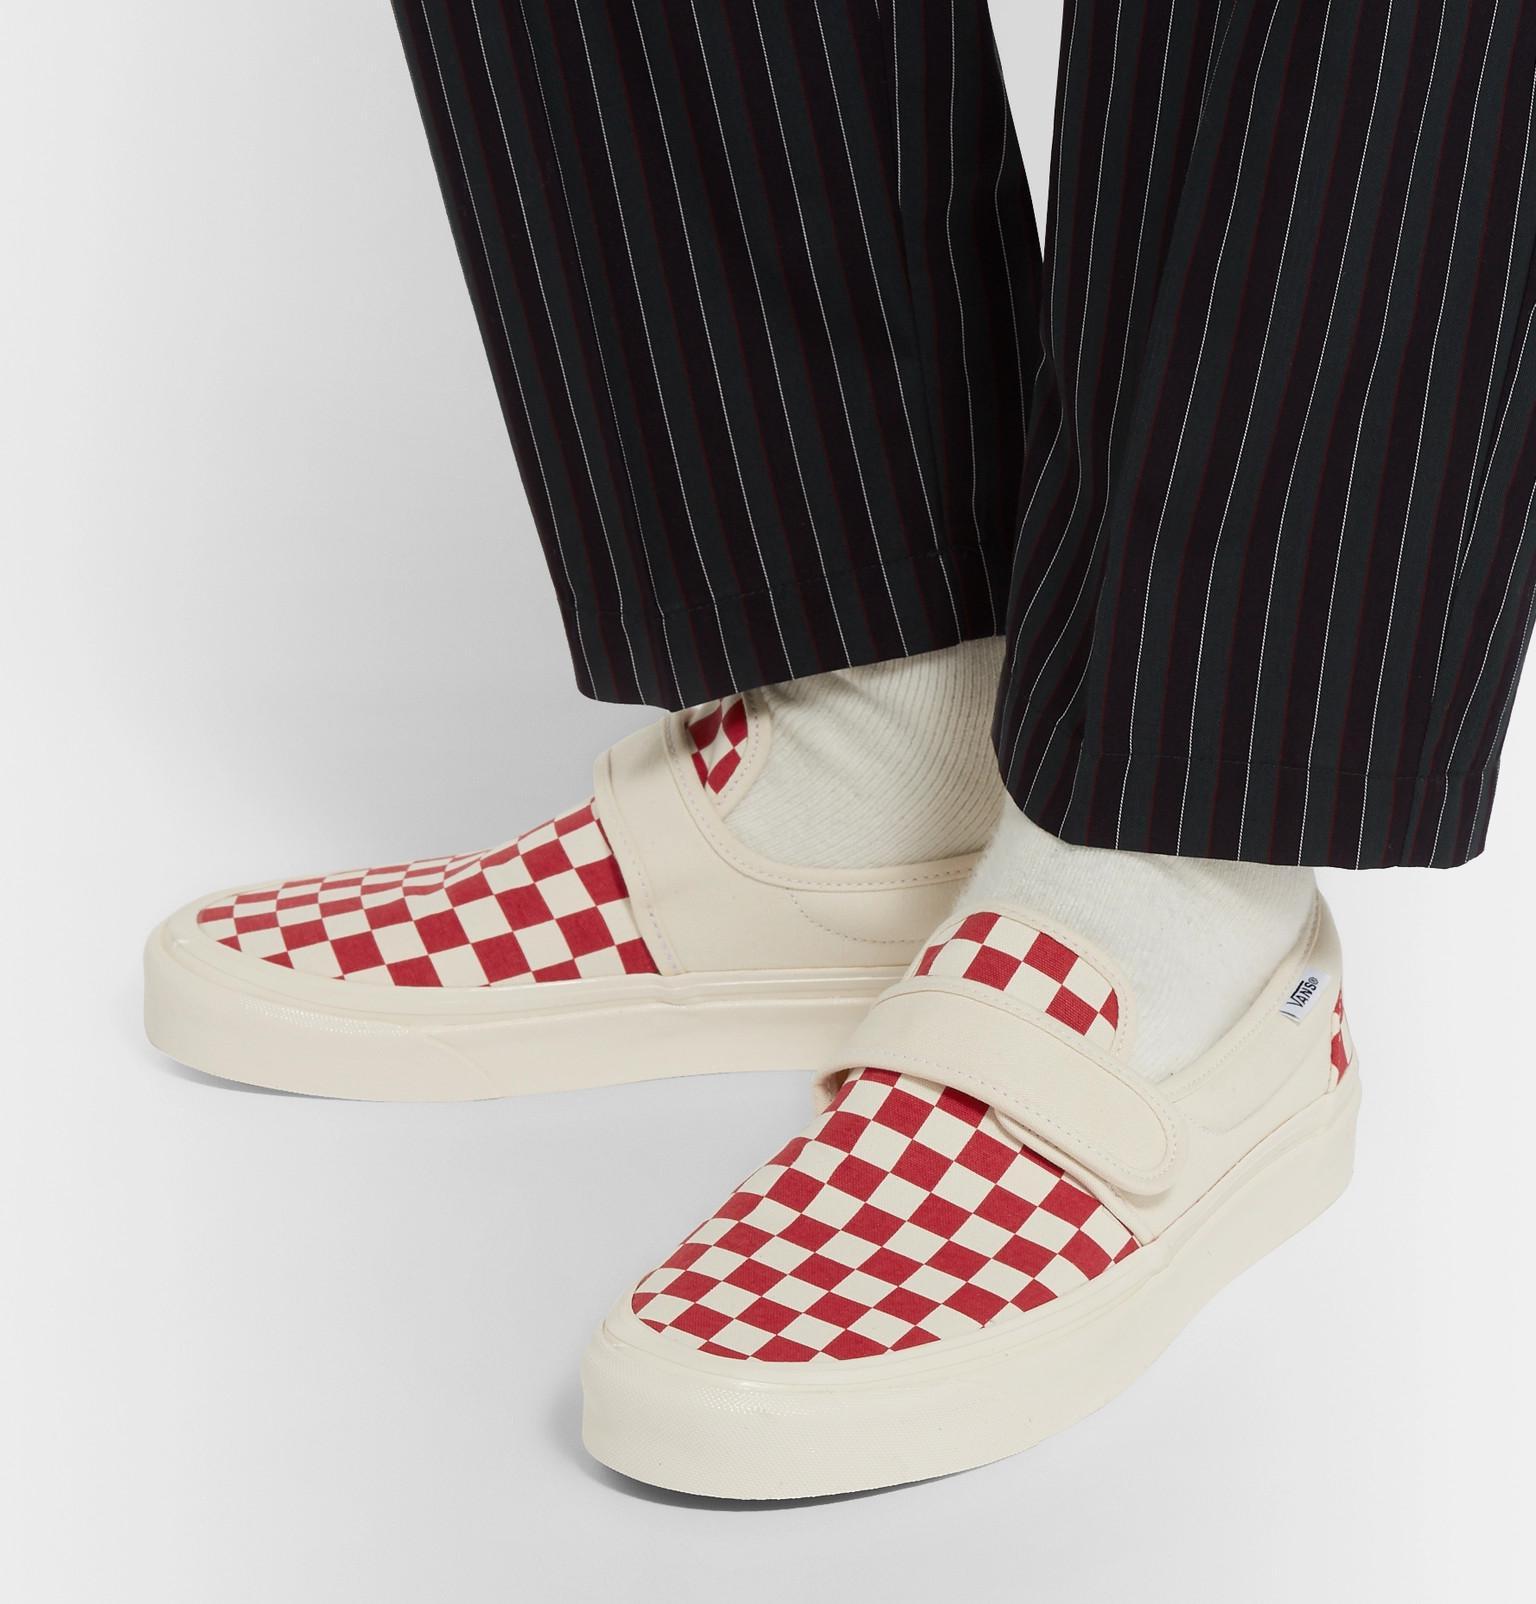 Nowa kolekcja sklep internetowy Hurt Anaheim Factory 47 V Dx Checkerboard Canvas Sneakers